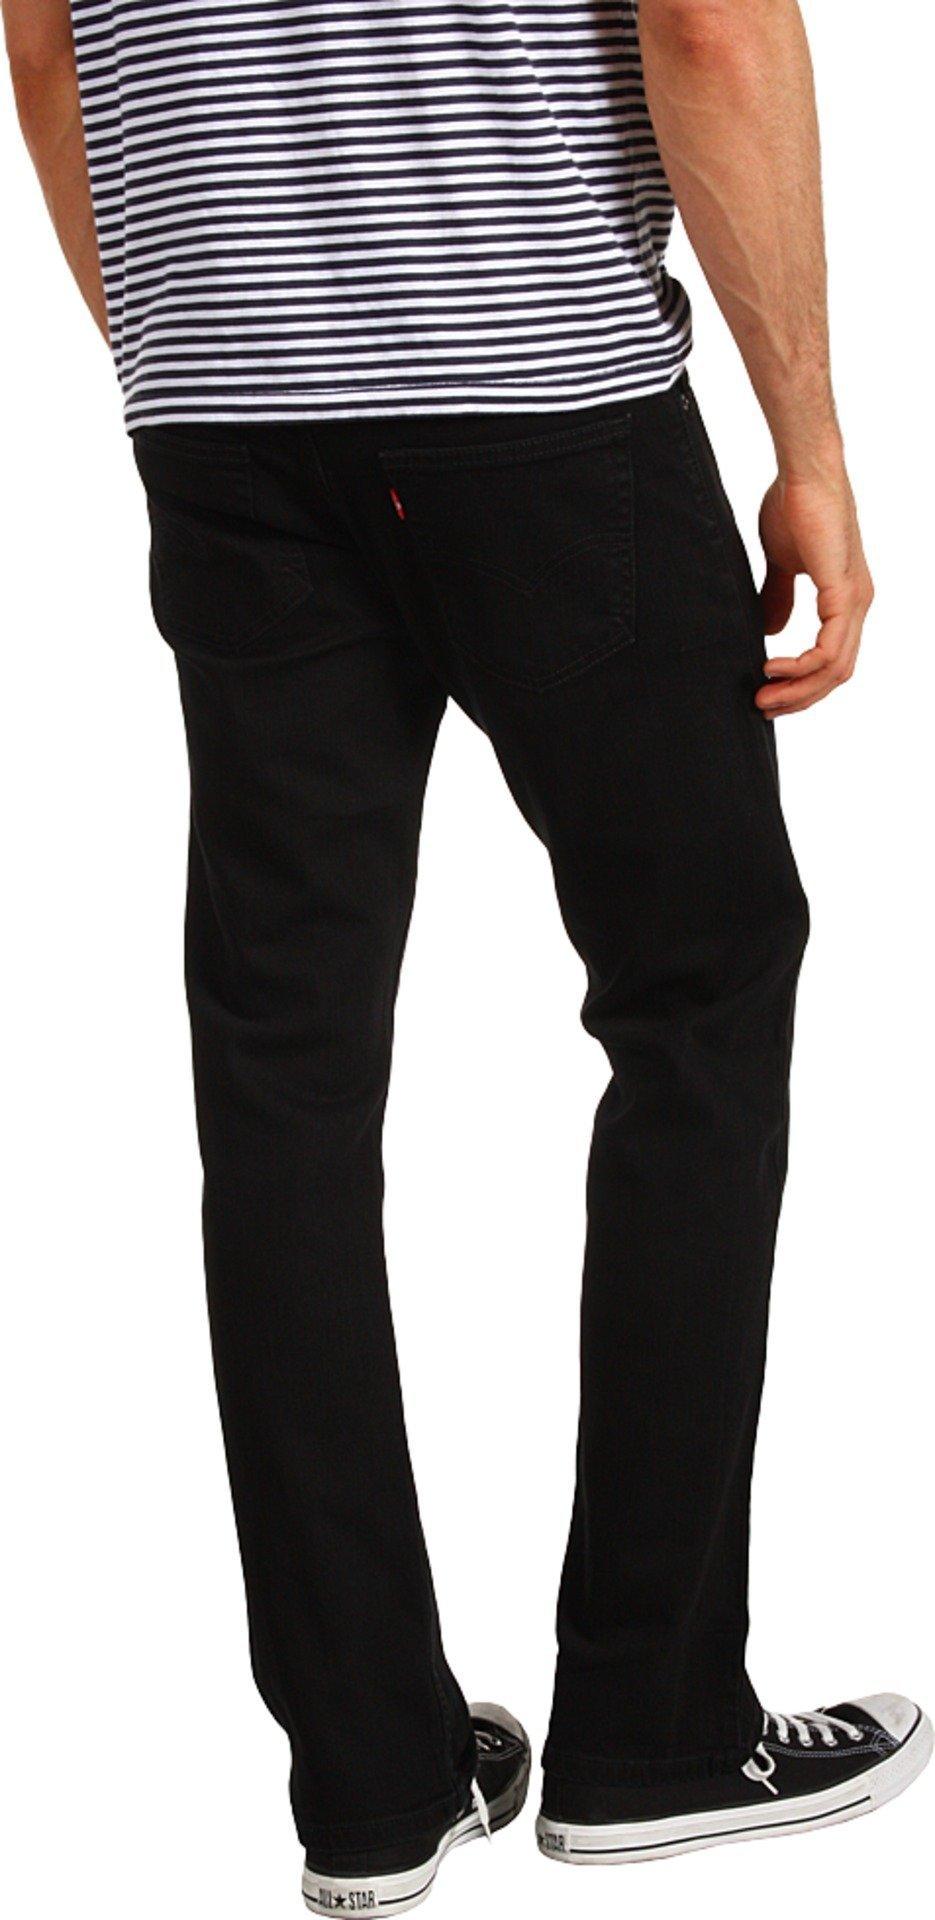 Levi's Men's 514 Straight fit Stretch Jean,  Black, 35x34 by Levi's